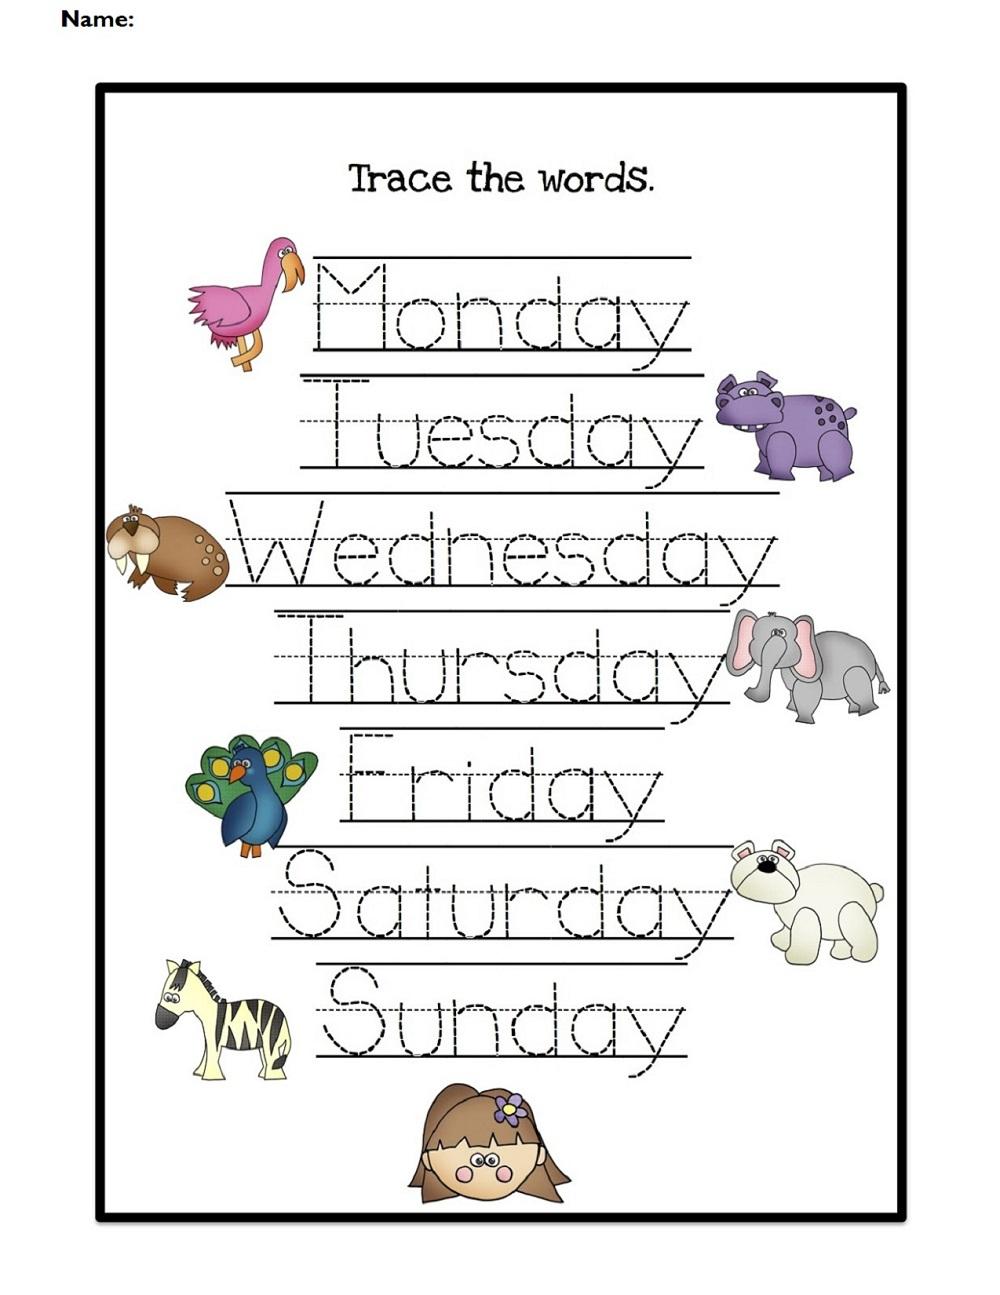 Worksheet For Days Of The Week For Kids   Kiddo Shelter   Free Printable Kindergarten Days Of The Week Worksheets